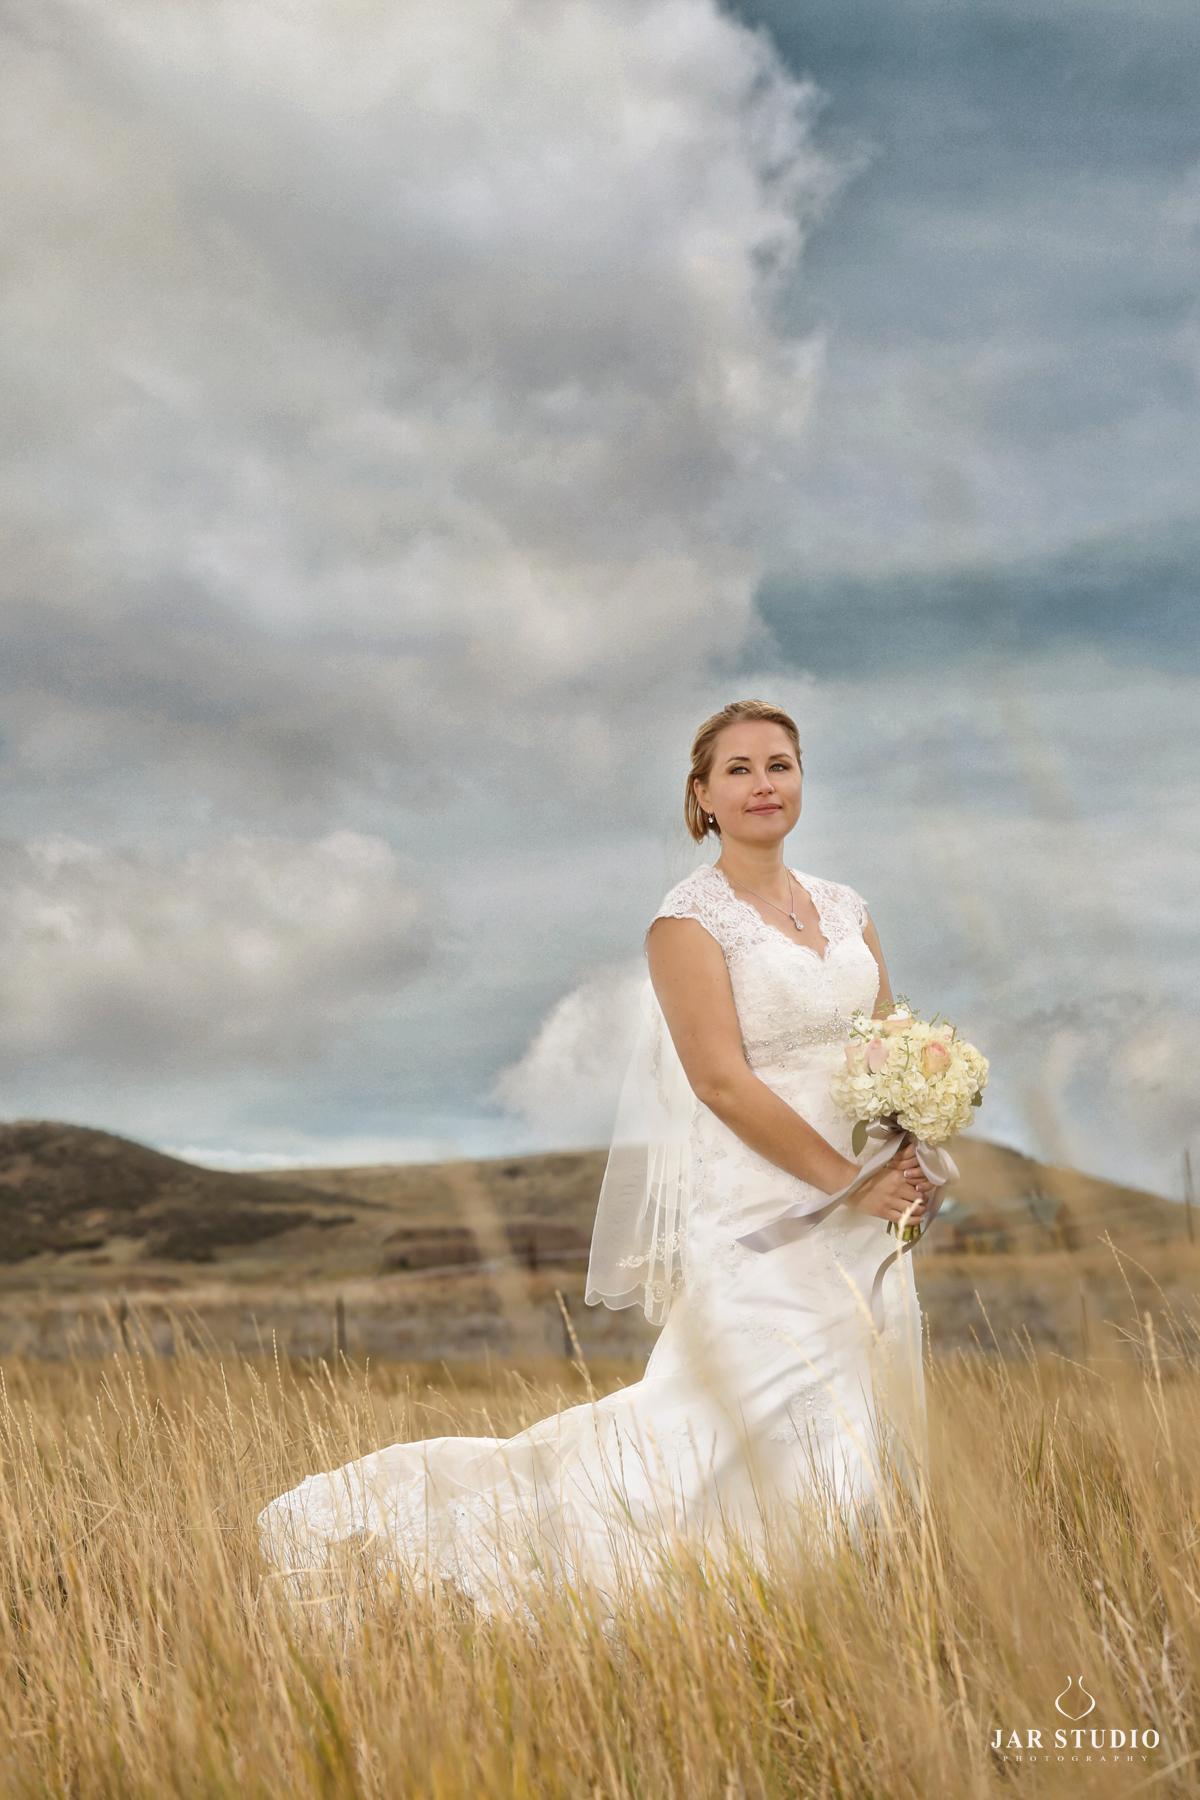 22-stunning-bridal-portrait-dress-outdoor-jarstudio.jpg